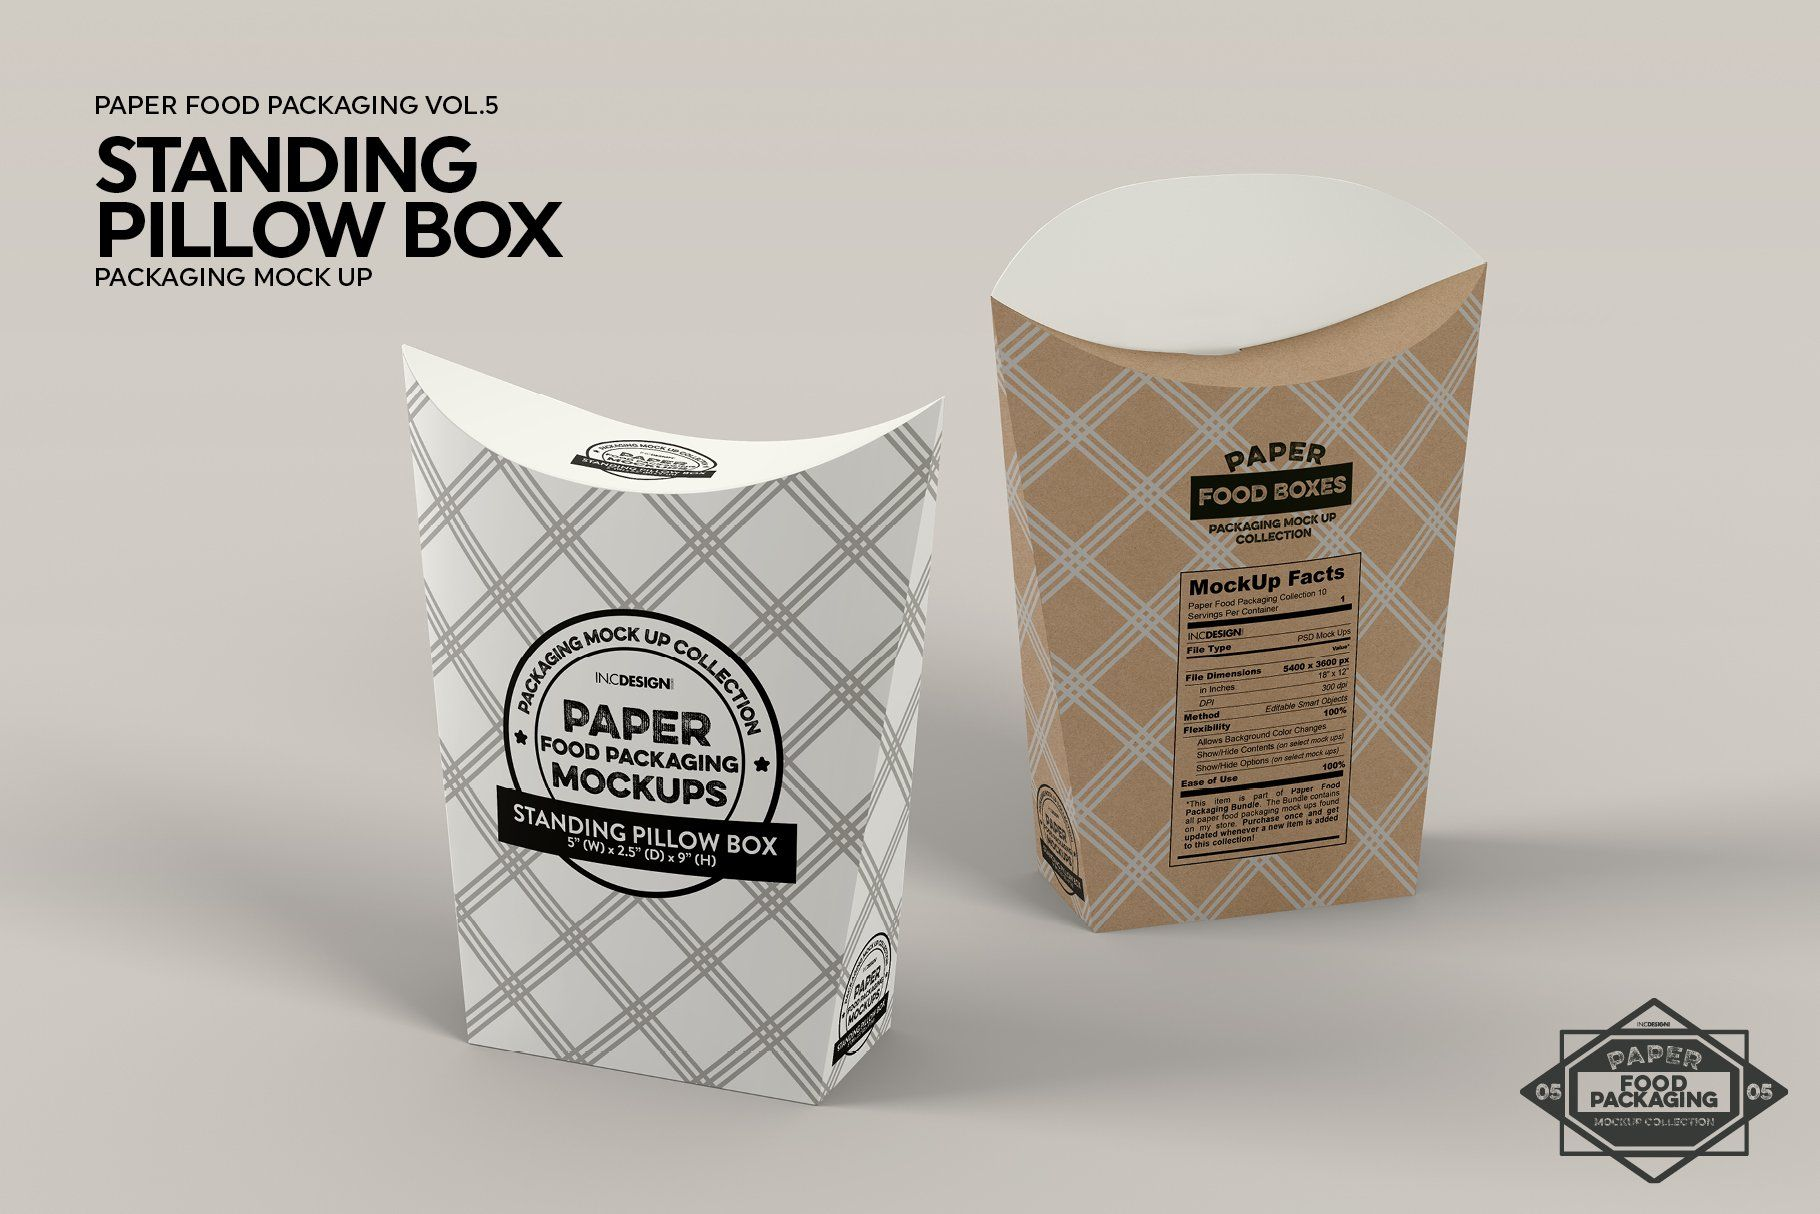 Standing Pillow Box Packaging Mockup Packaging Mockup Free Packaging Mockup Box Packaging